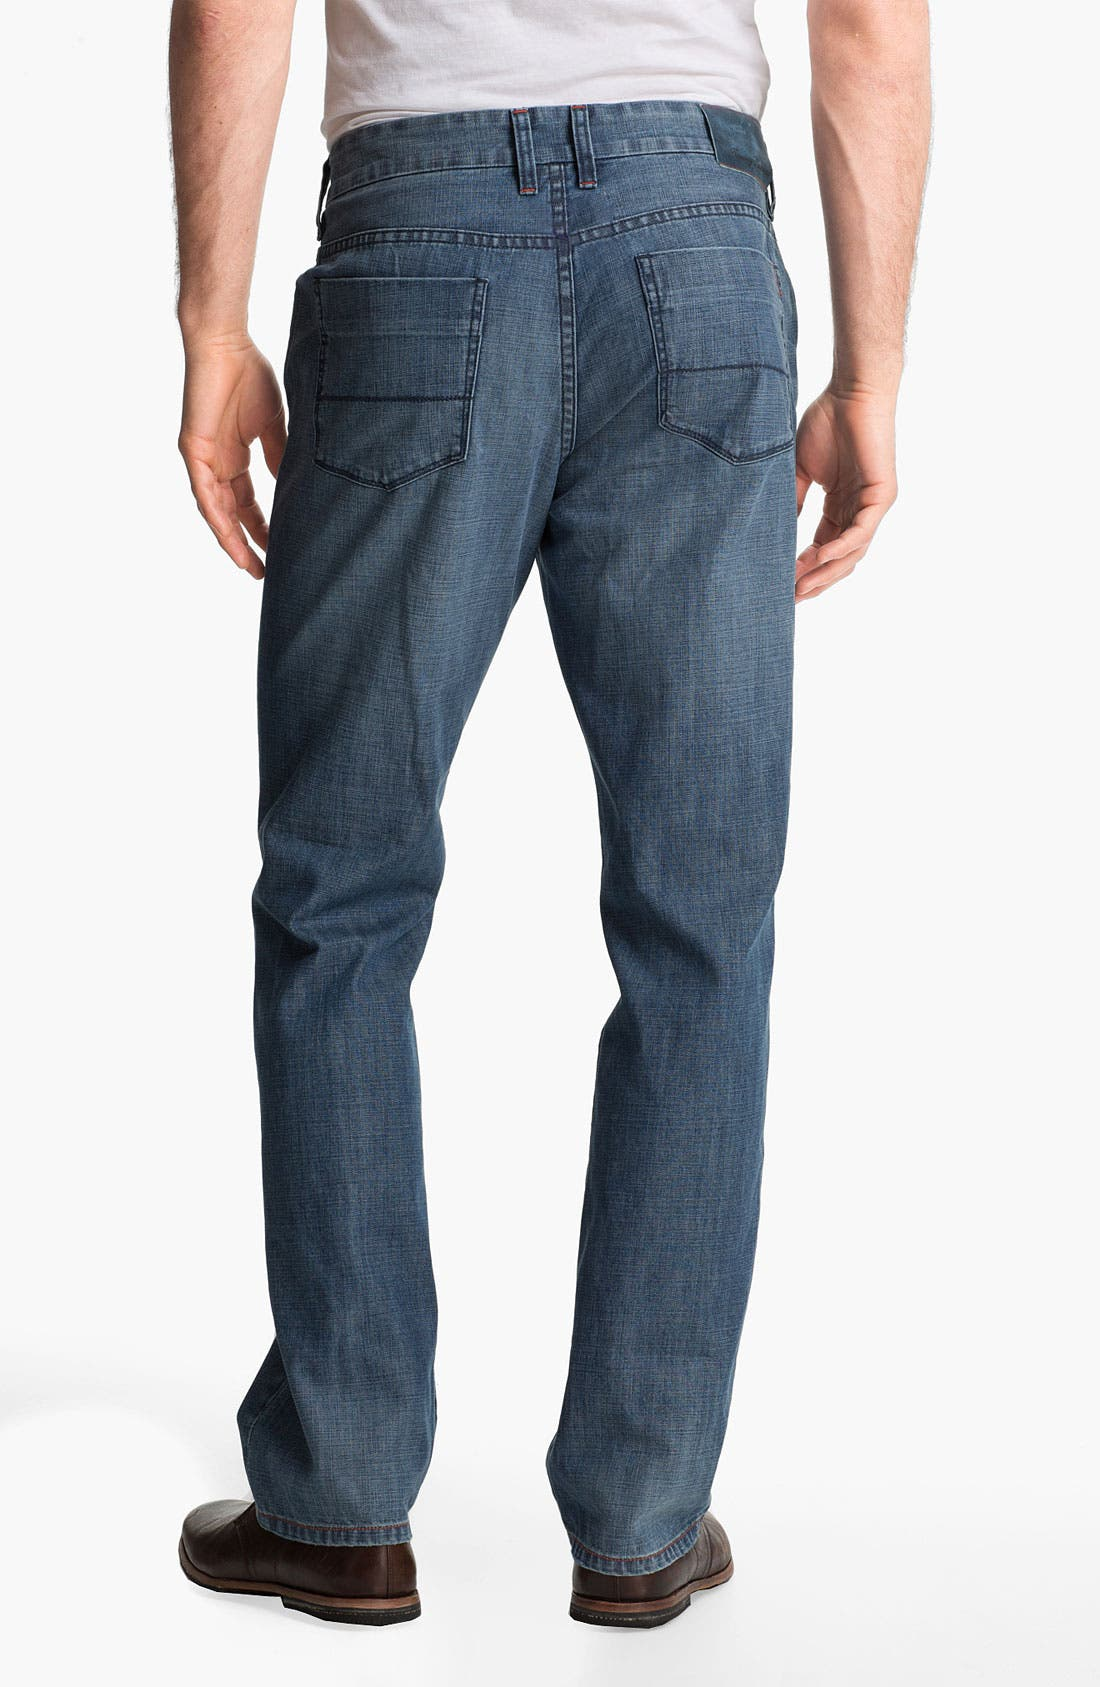 Alternate Image 2  - Tommy Bahama Denim 'Cruz' Authentic Fit Jeans (Medium)